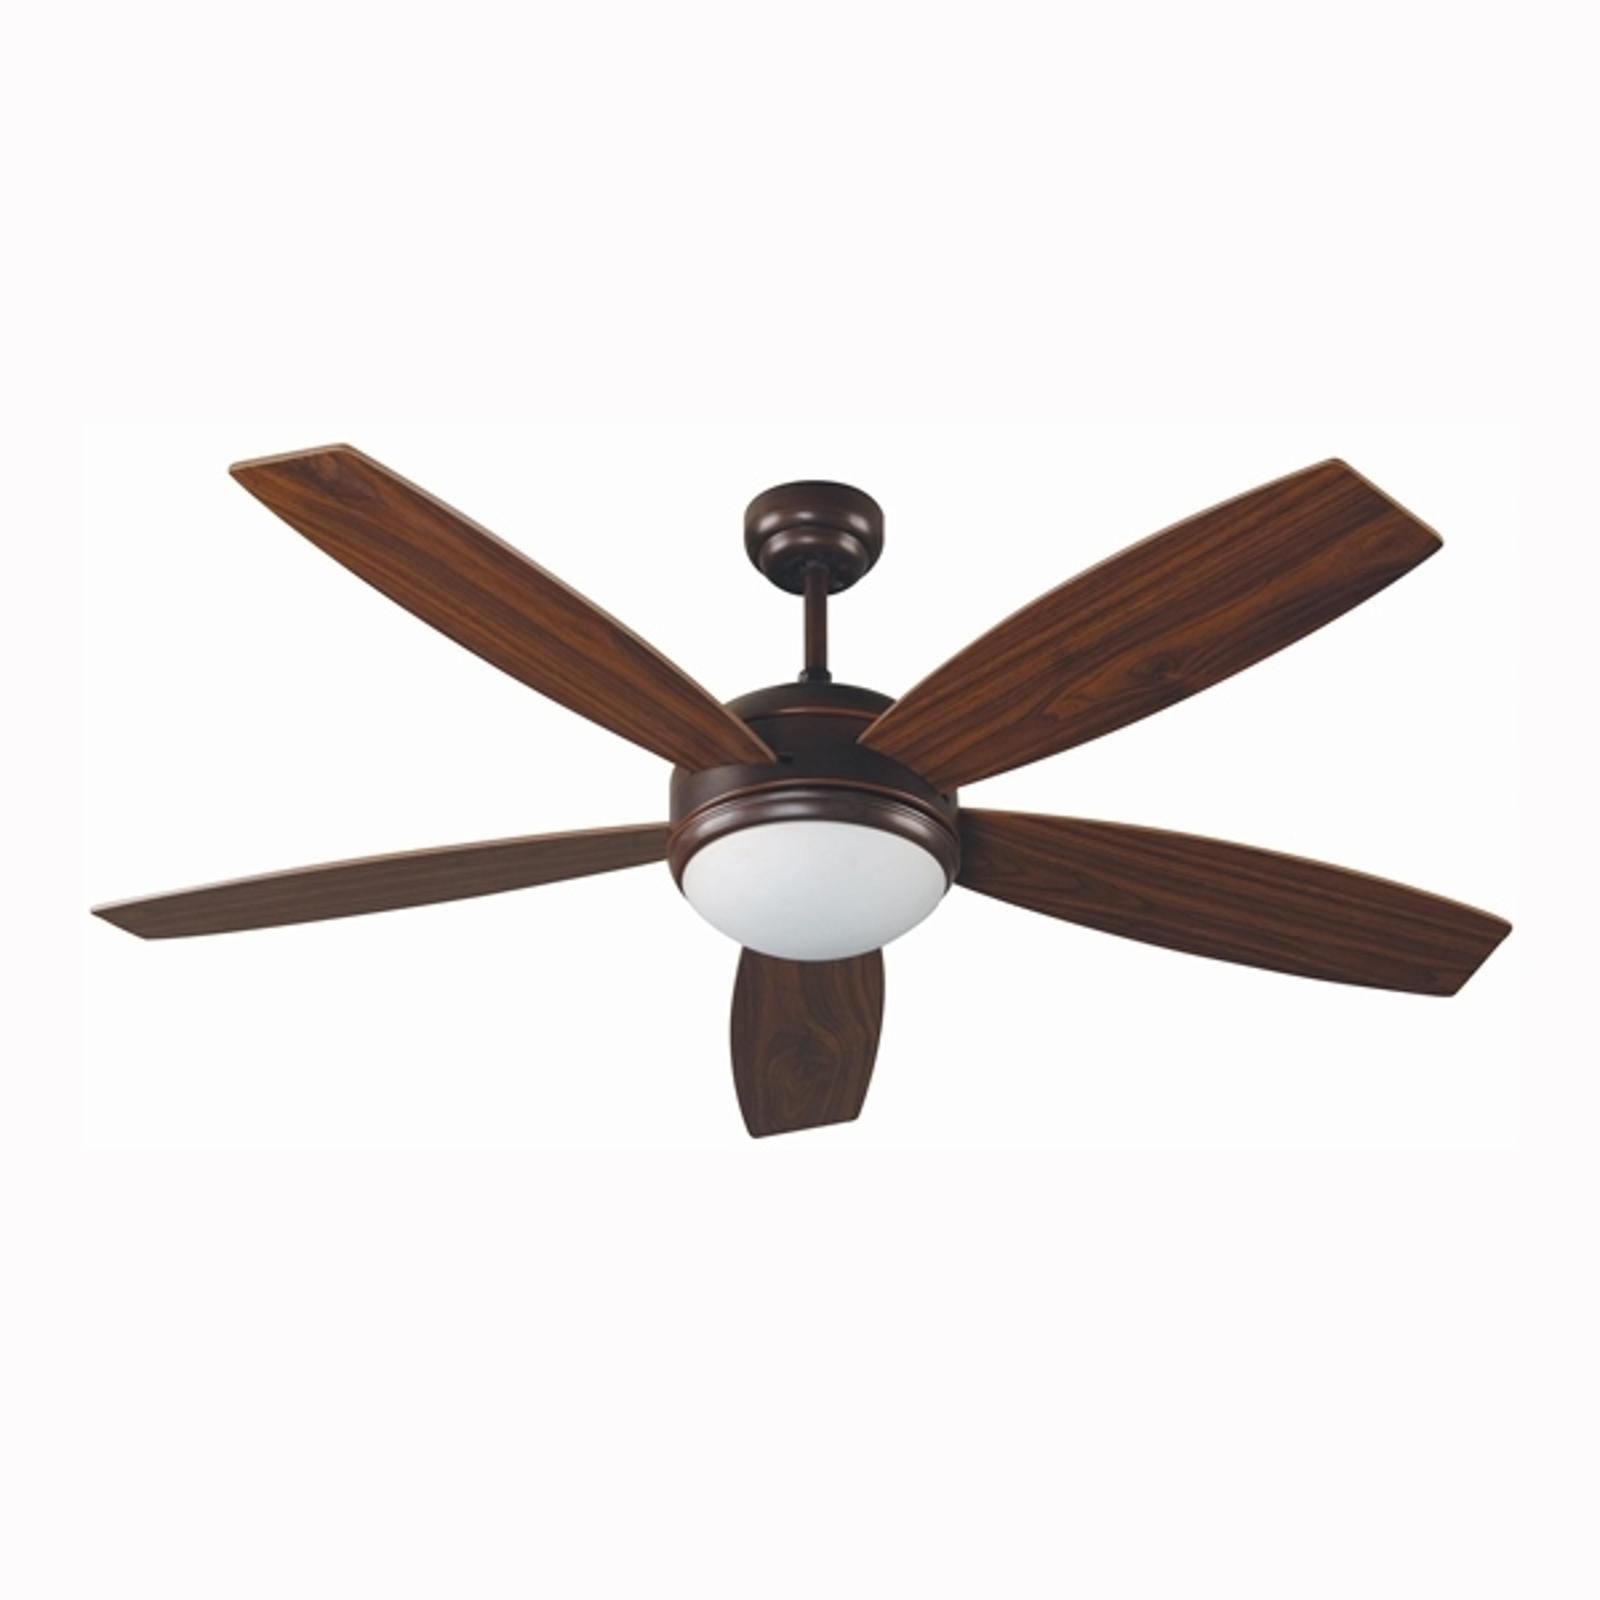 Ventilateur de plafond brun VANU avec télécommande